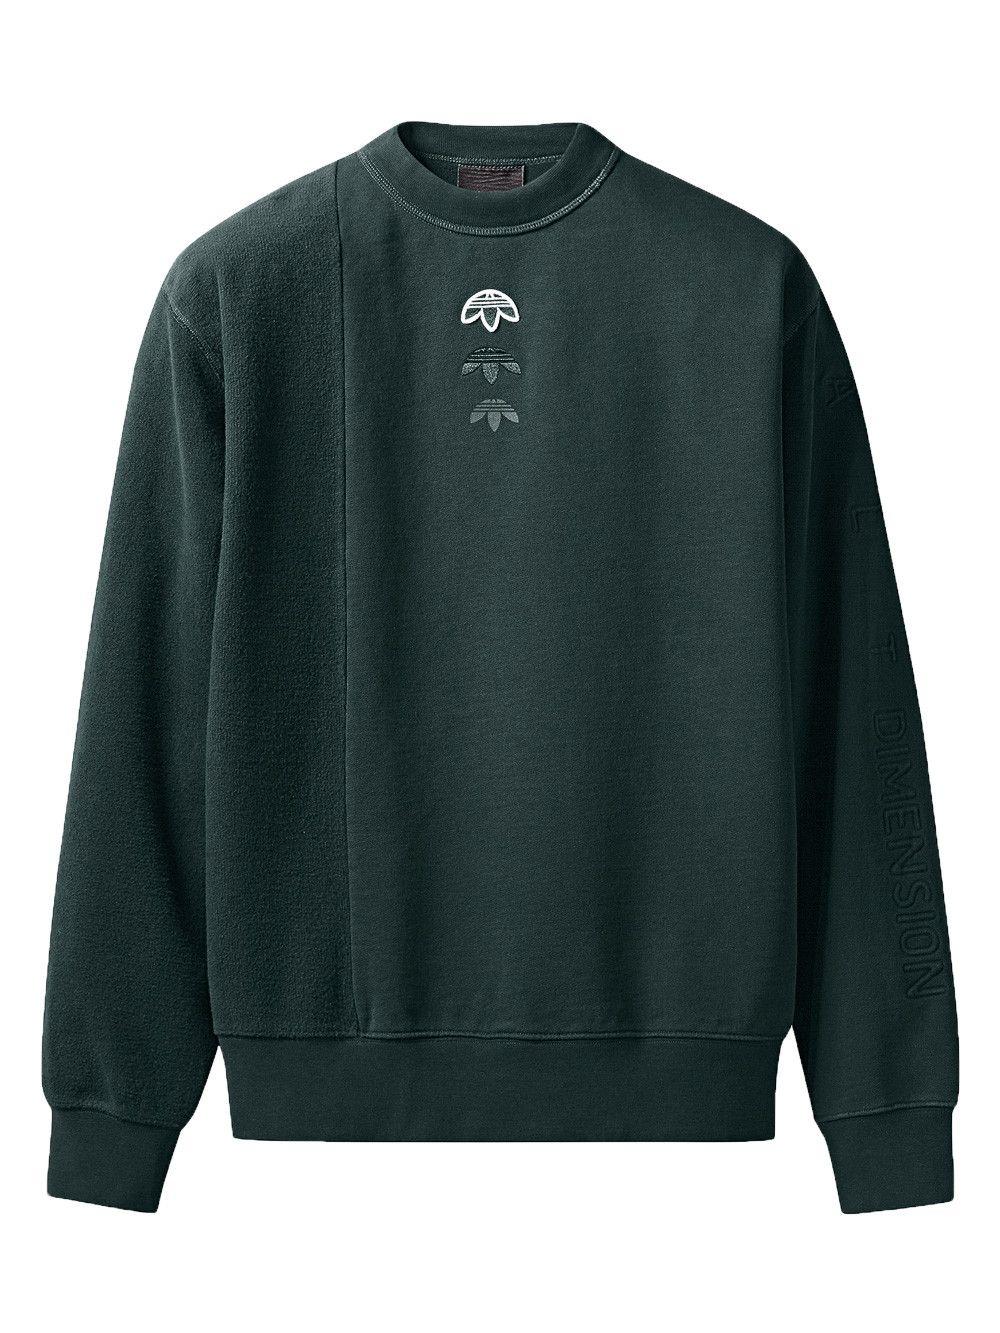 Adidas Originals By Alexander Wang Aw Inout Crew Neck Sweatshirt Modesens Mens Sweatshirts Hoodie Adidas Shirt Mens Adidas Hoodie Mens [ 1333 x 1000 Pixel ]